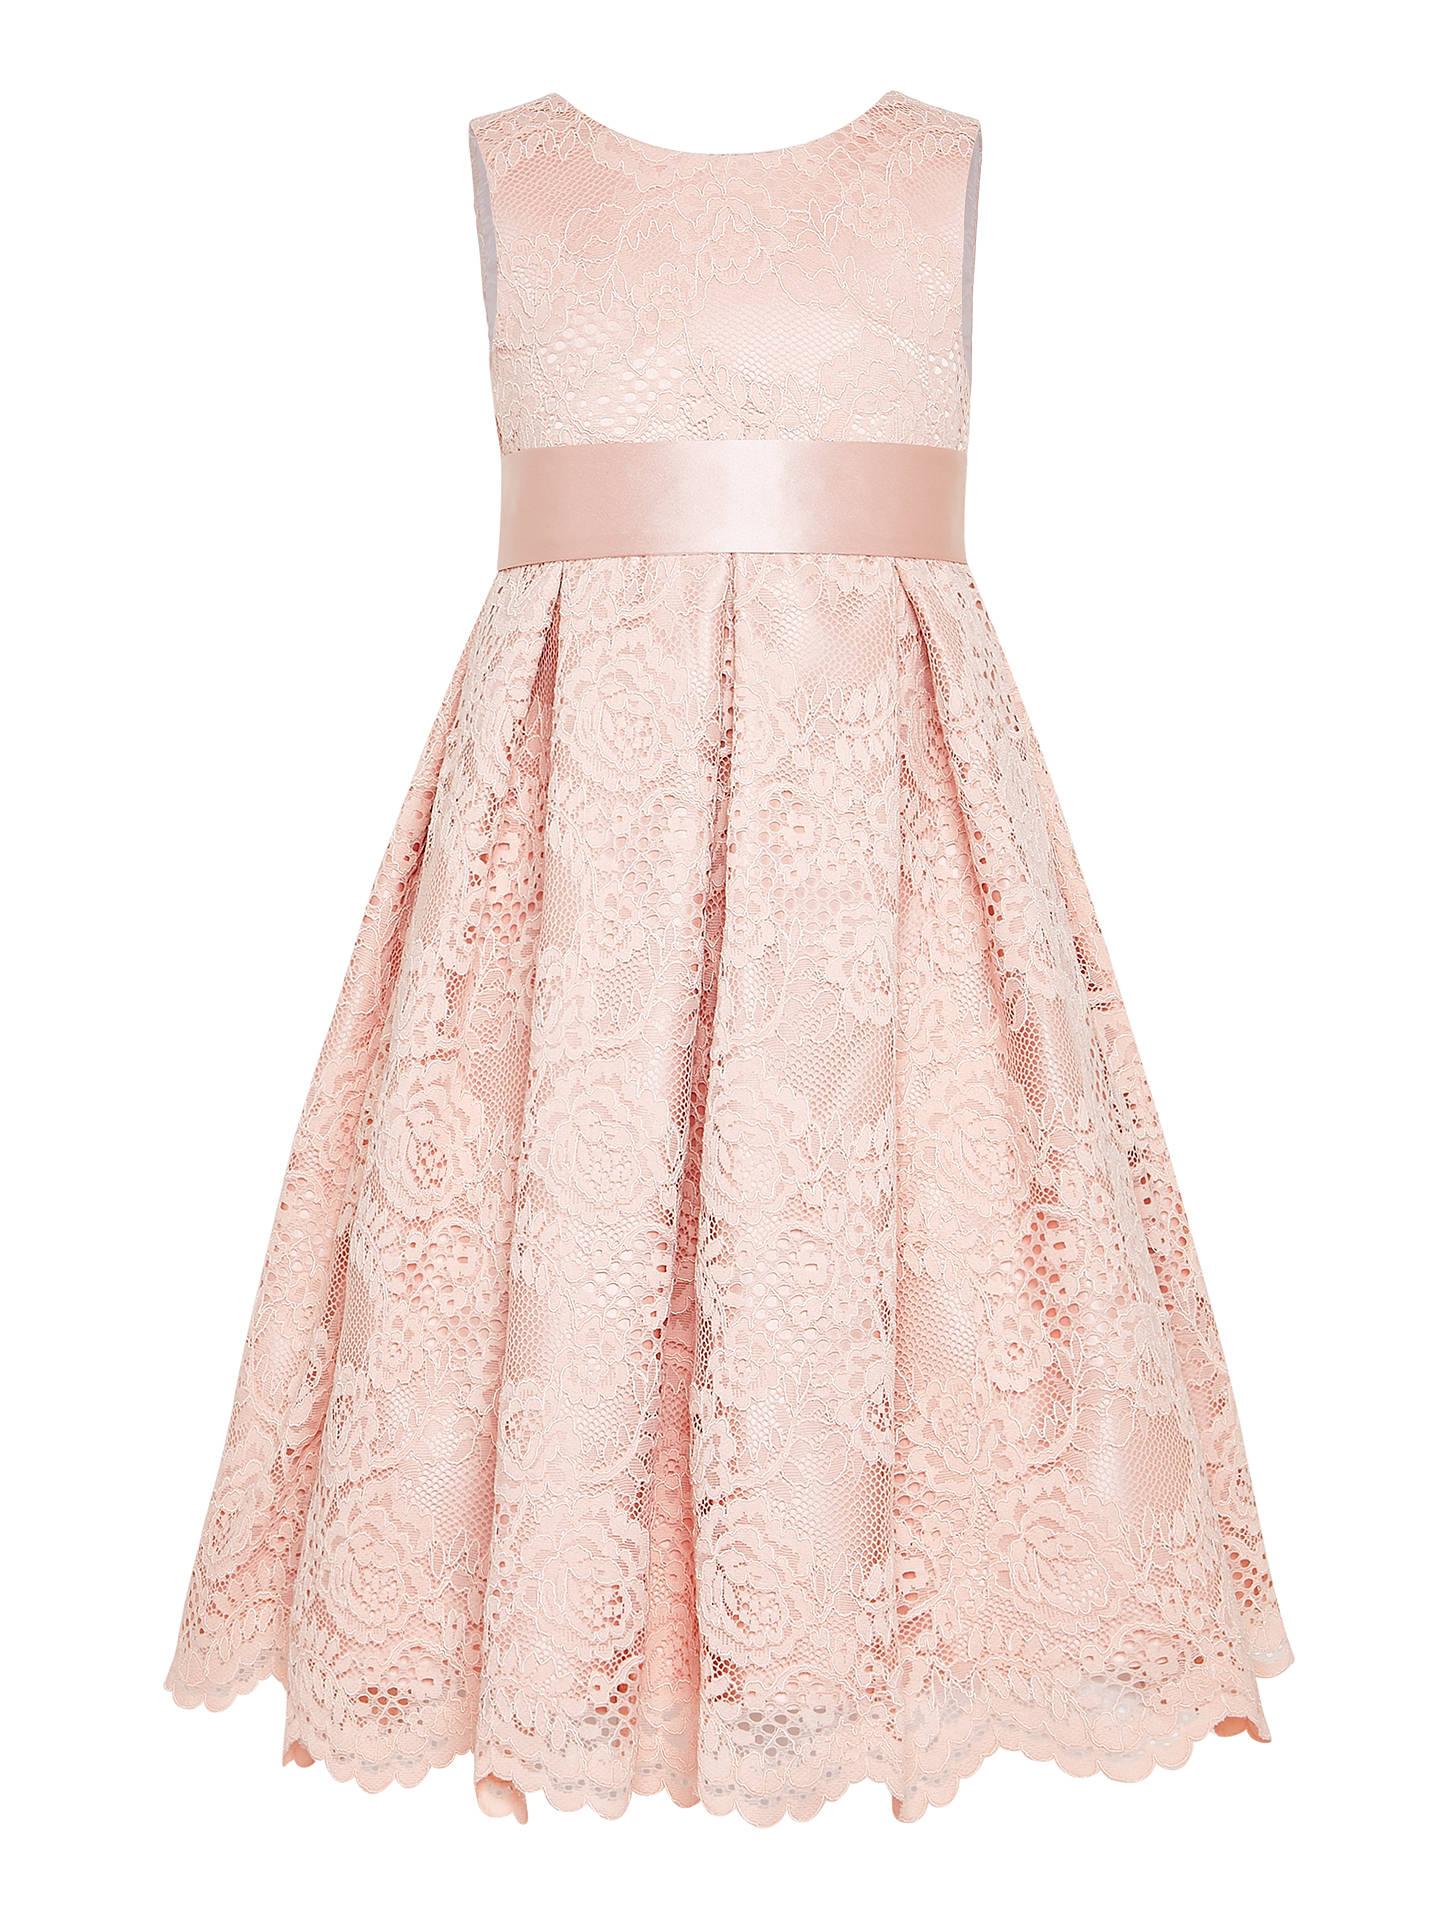 65bd2144e413 Buy John Lewis   Partners Girls  Corded Lace Bridesmaid Dress